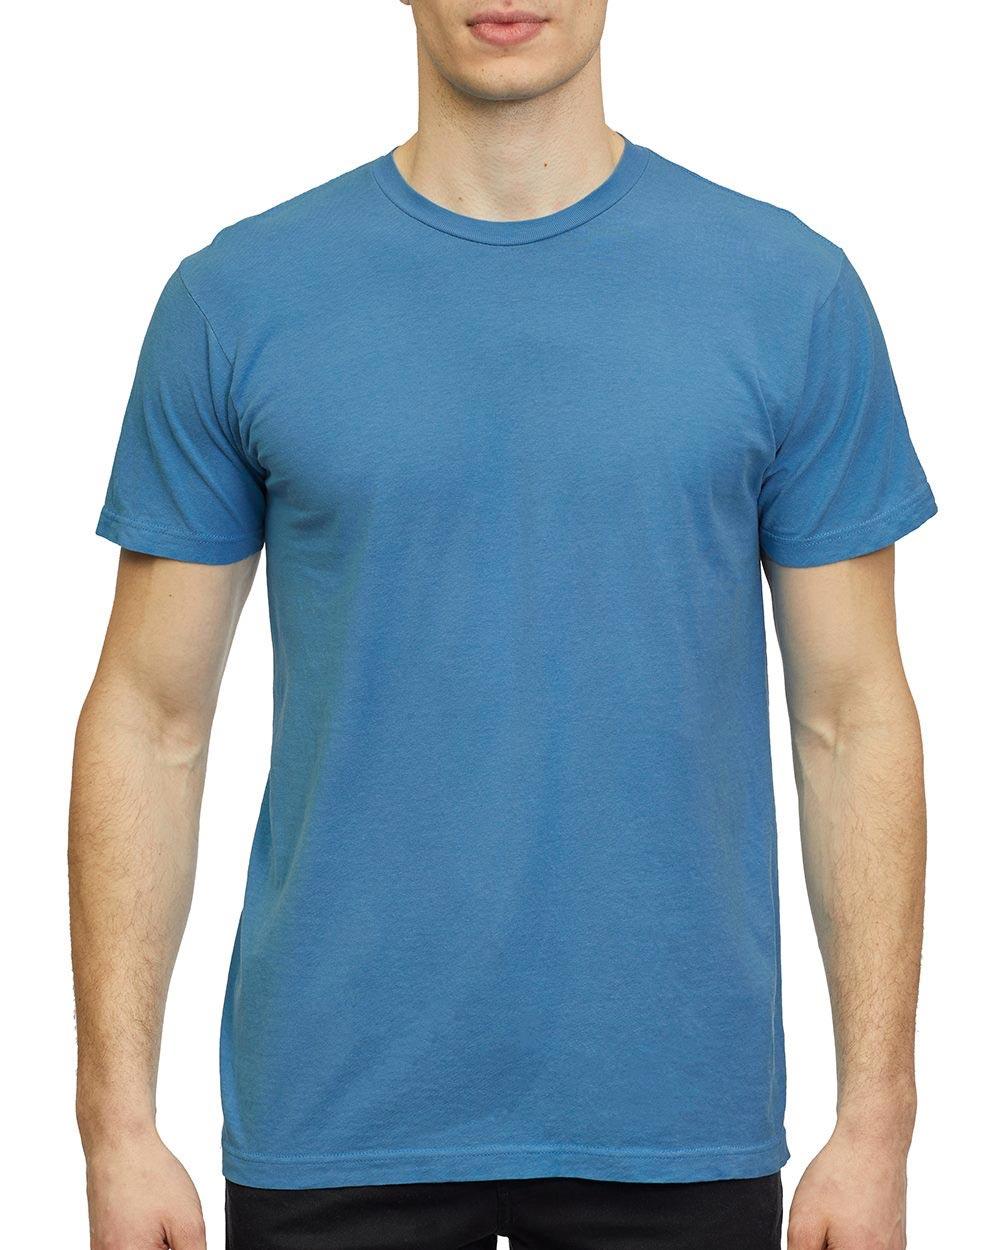 M&O Knits 6500M - Unisex Vintage Garment-Dyed T-Shirt